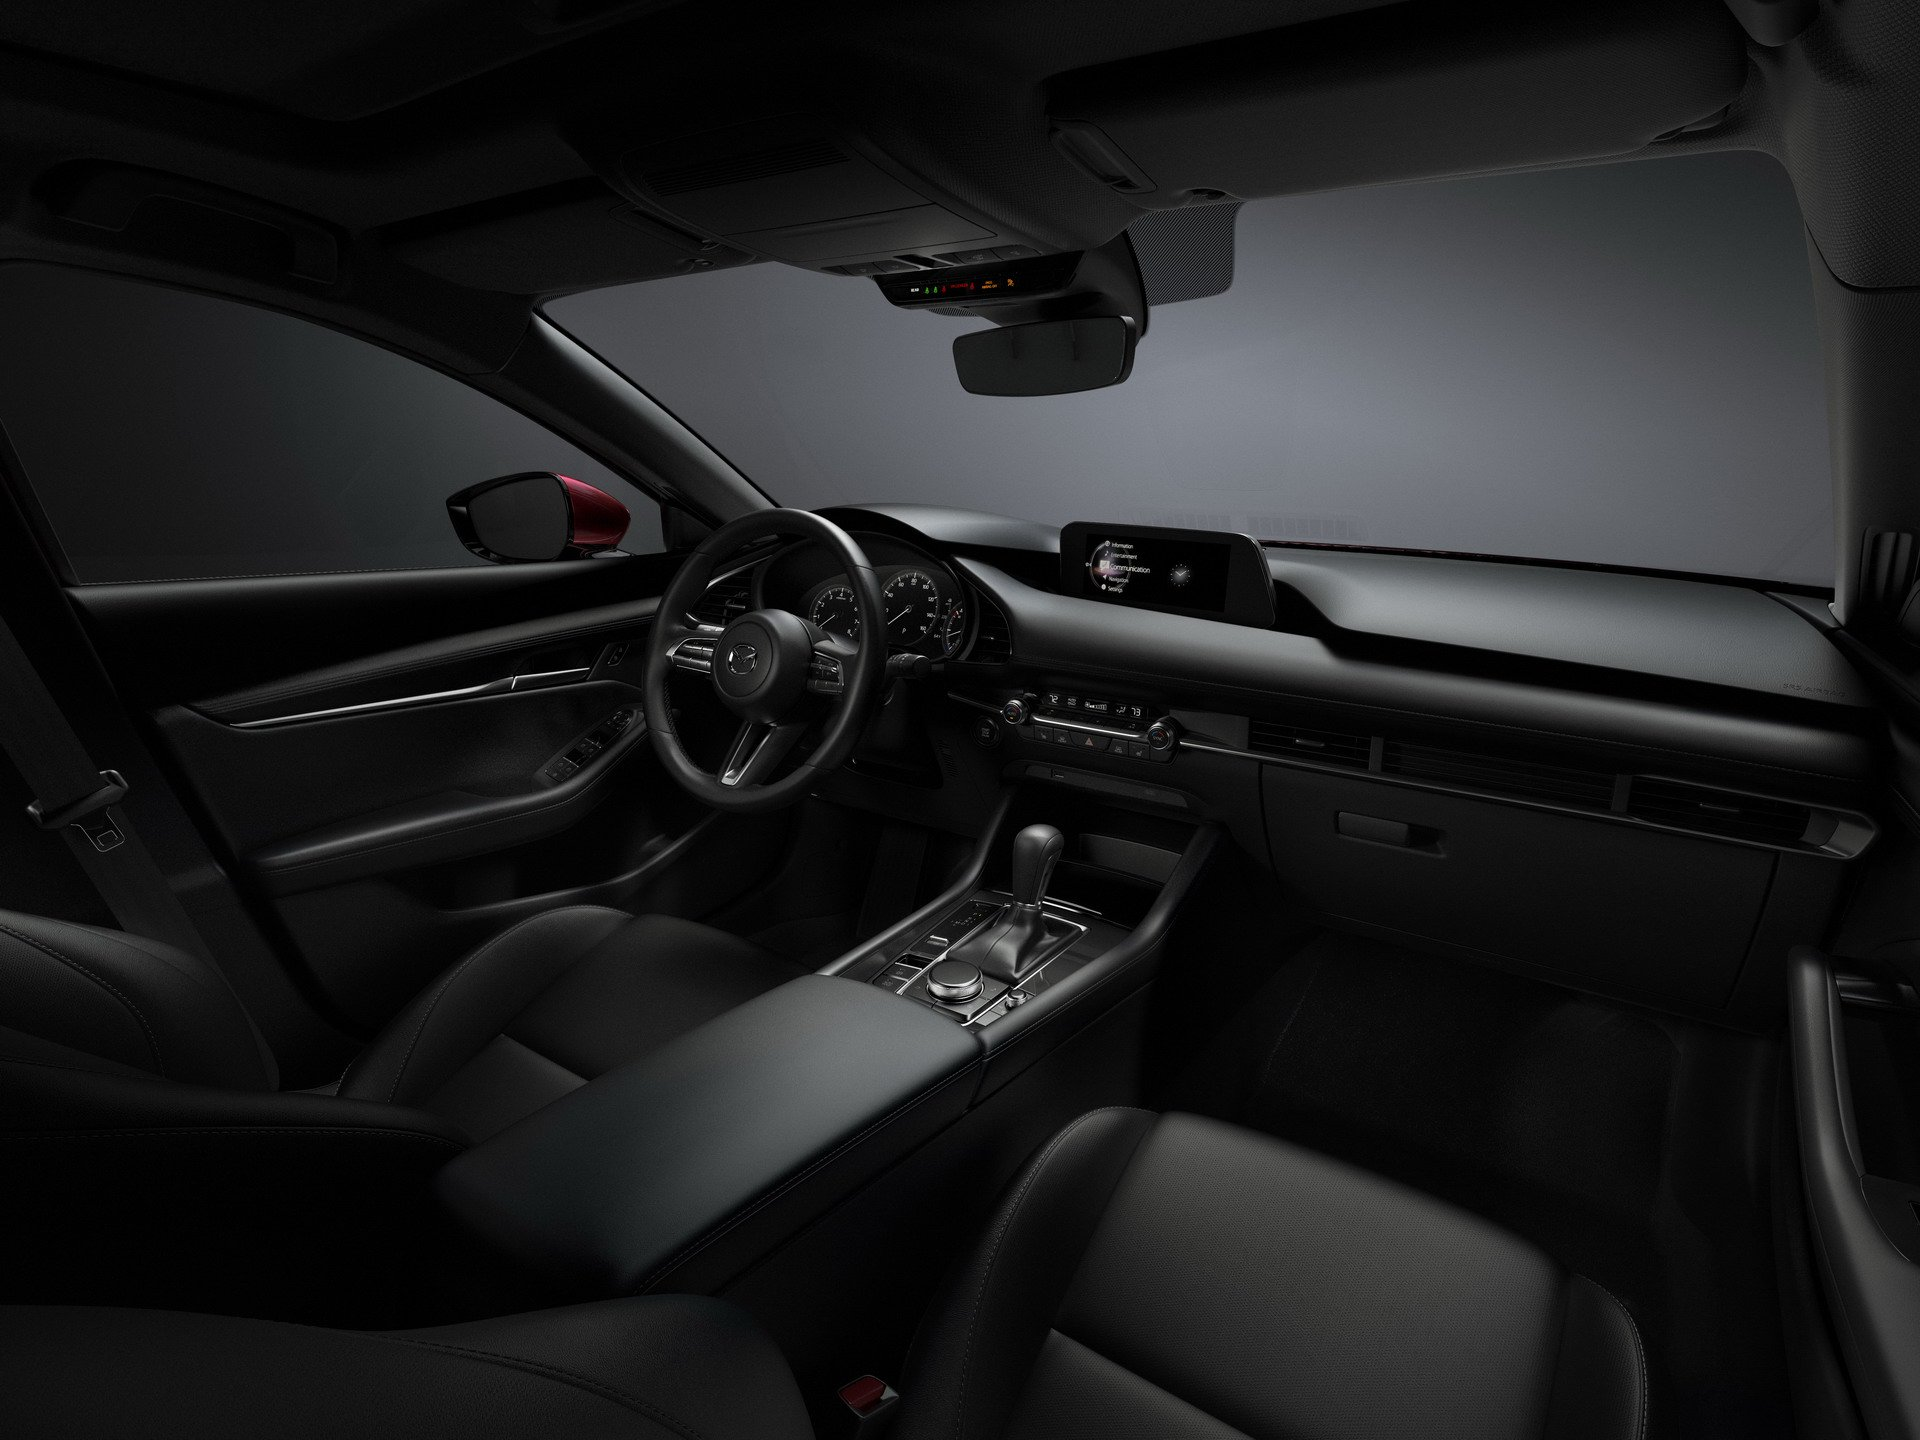 2019-mazda-3-sedan-hatch-9.jpg